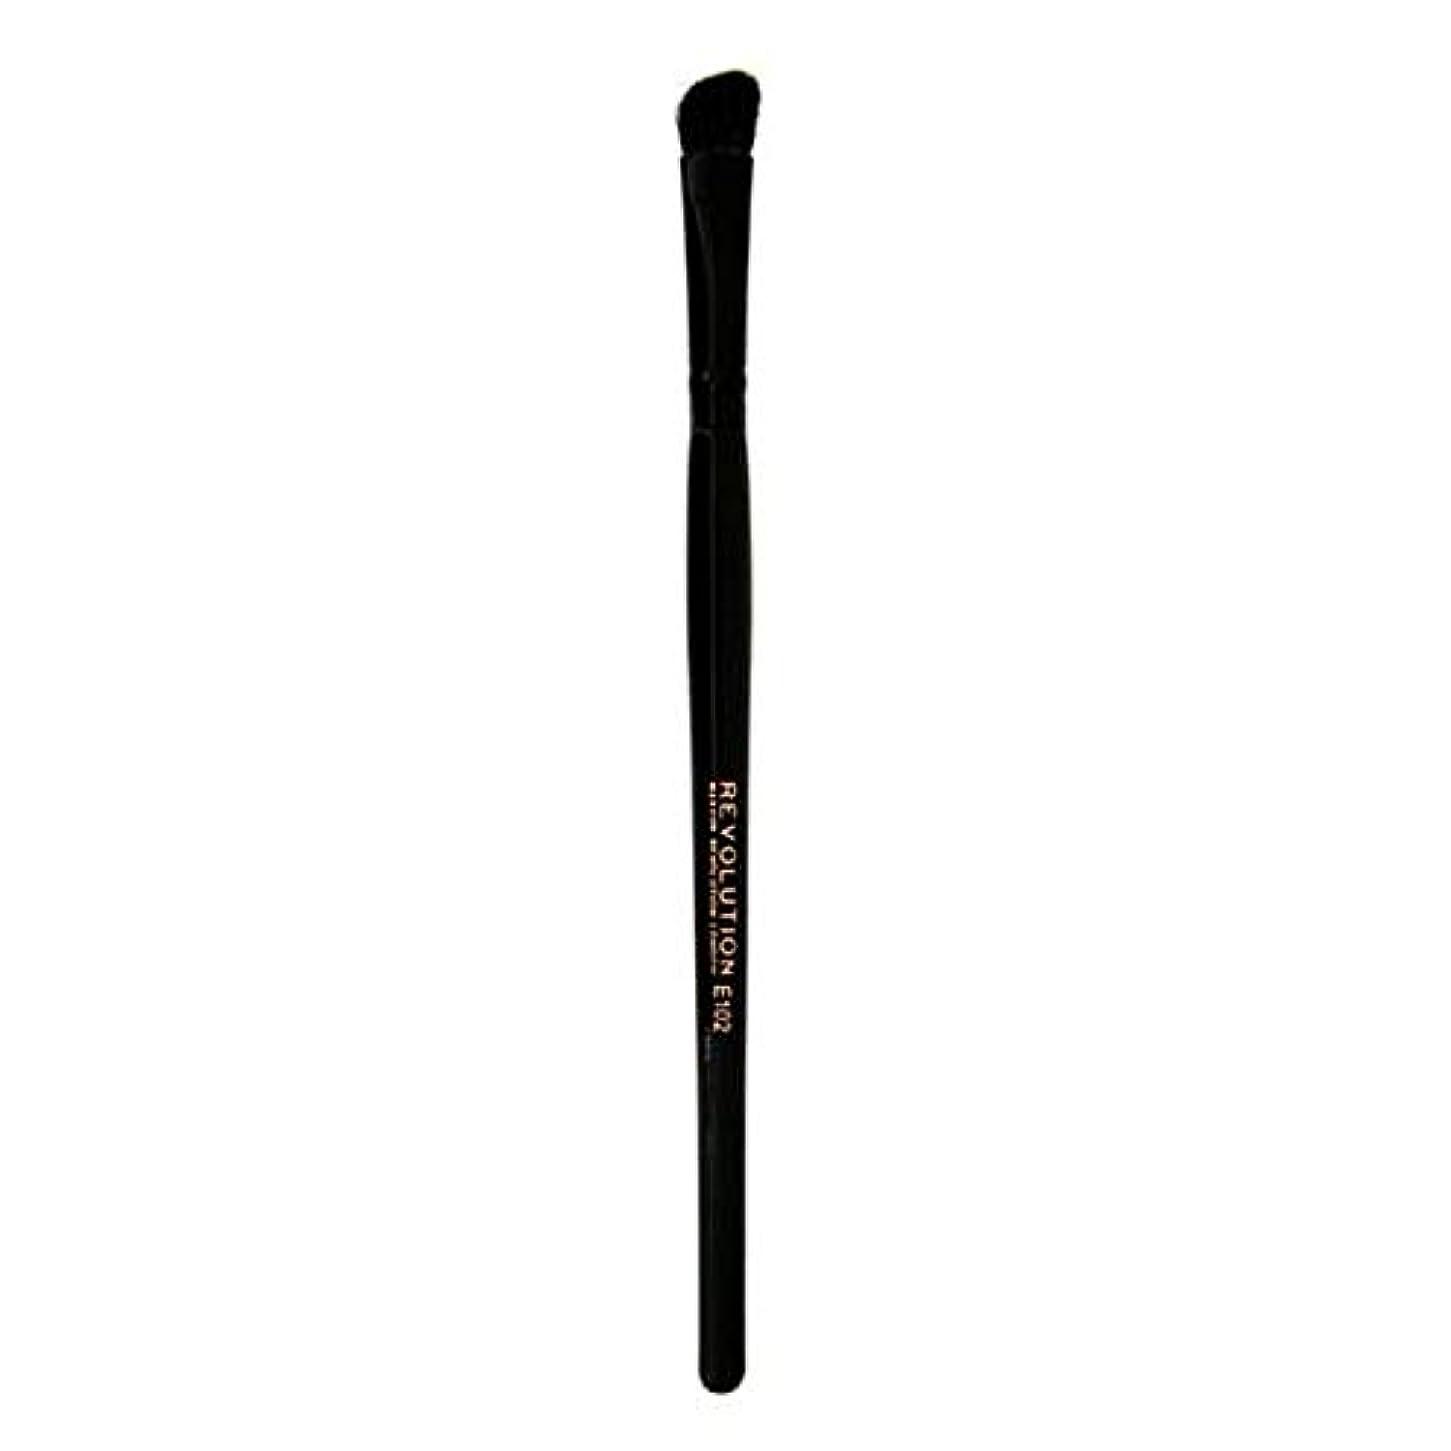 [Revolution ] 革命プロE102アイシャドウの輪郭メイクブラシ - Revolution Pro E102 Eyeshadow Contour Makeup Brush [並行輸入品]